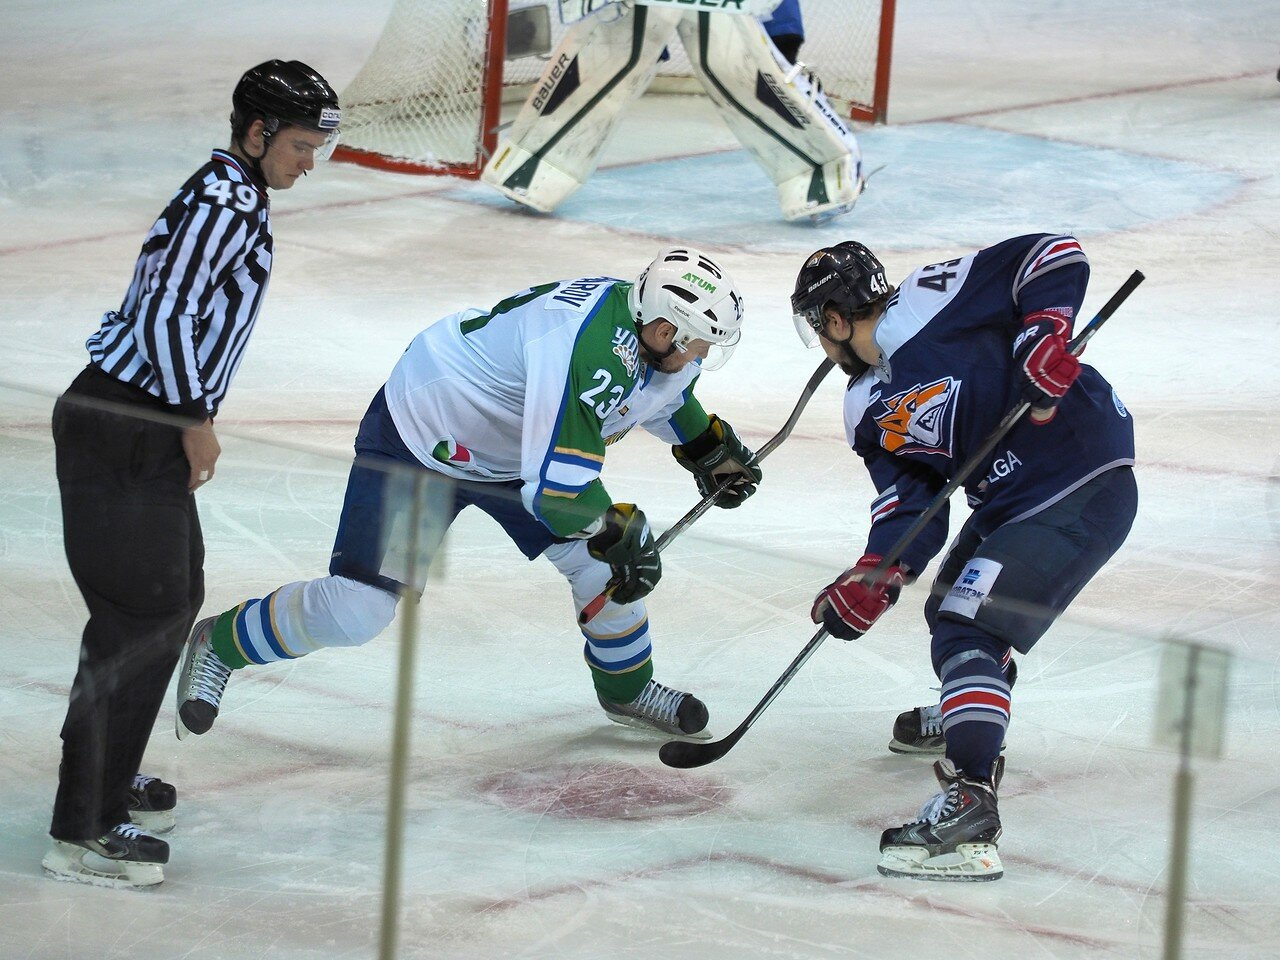 52Плей-офф 2016 Восток Финал Металлург - Салават Юлаев 31.03.2016